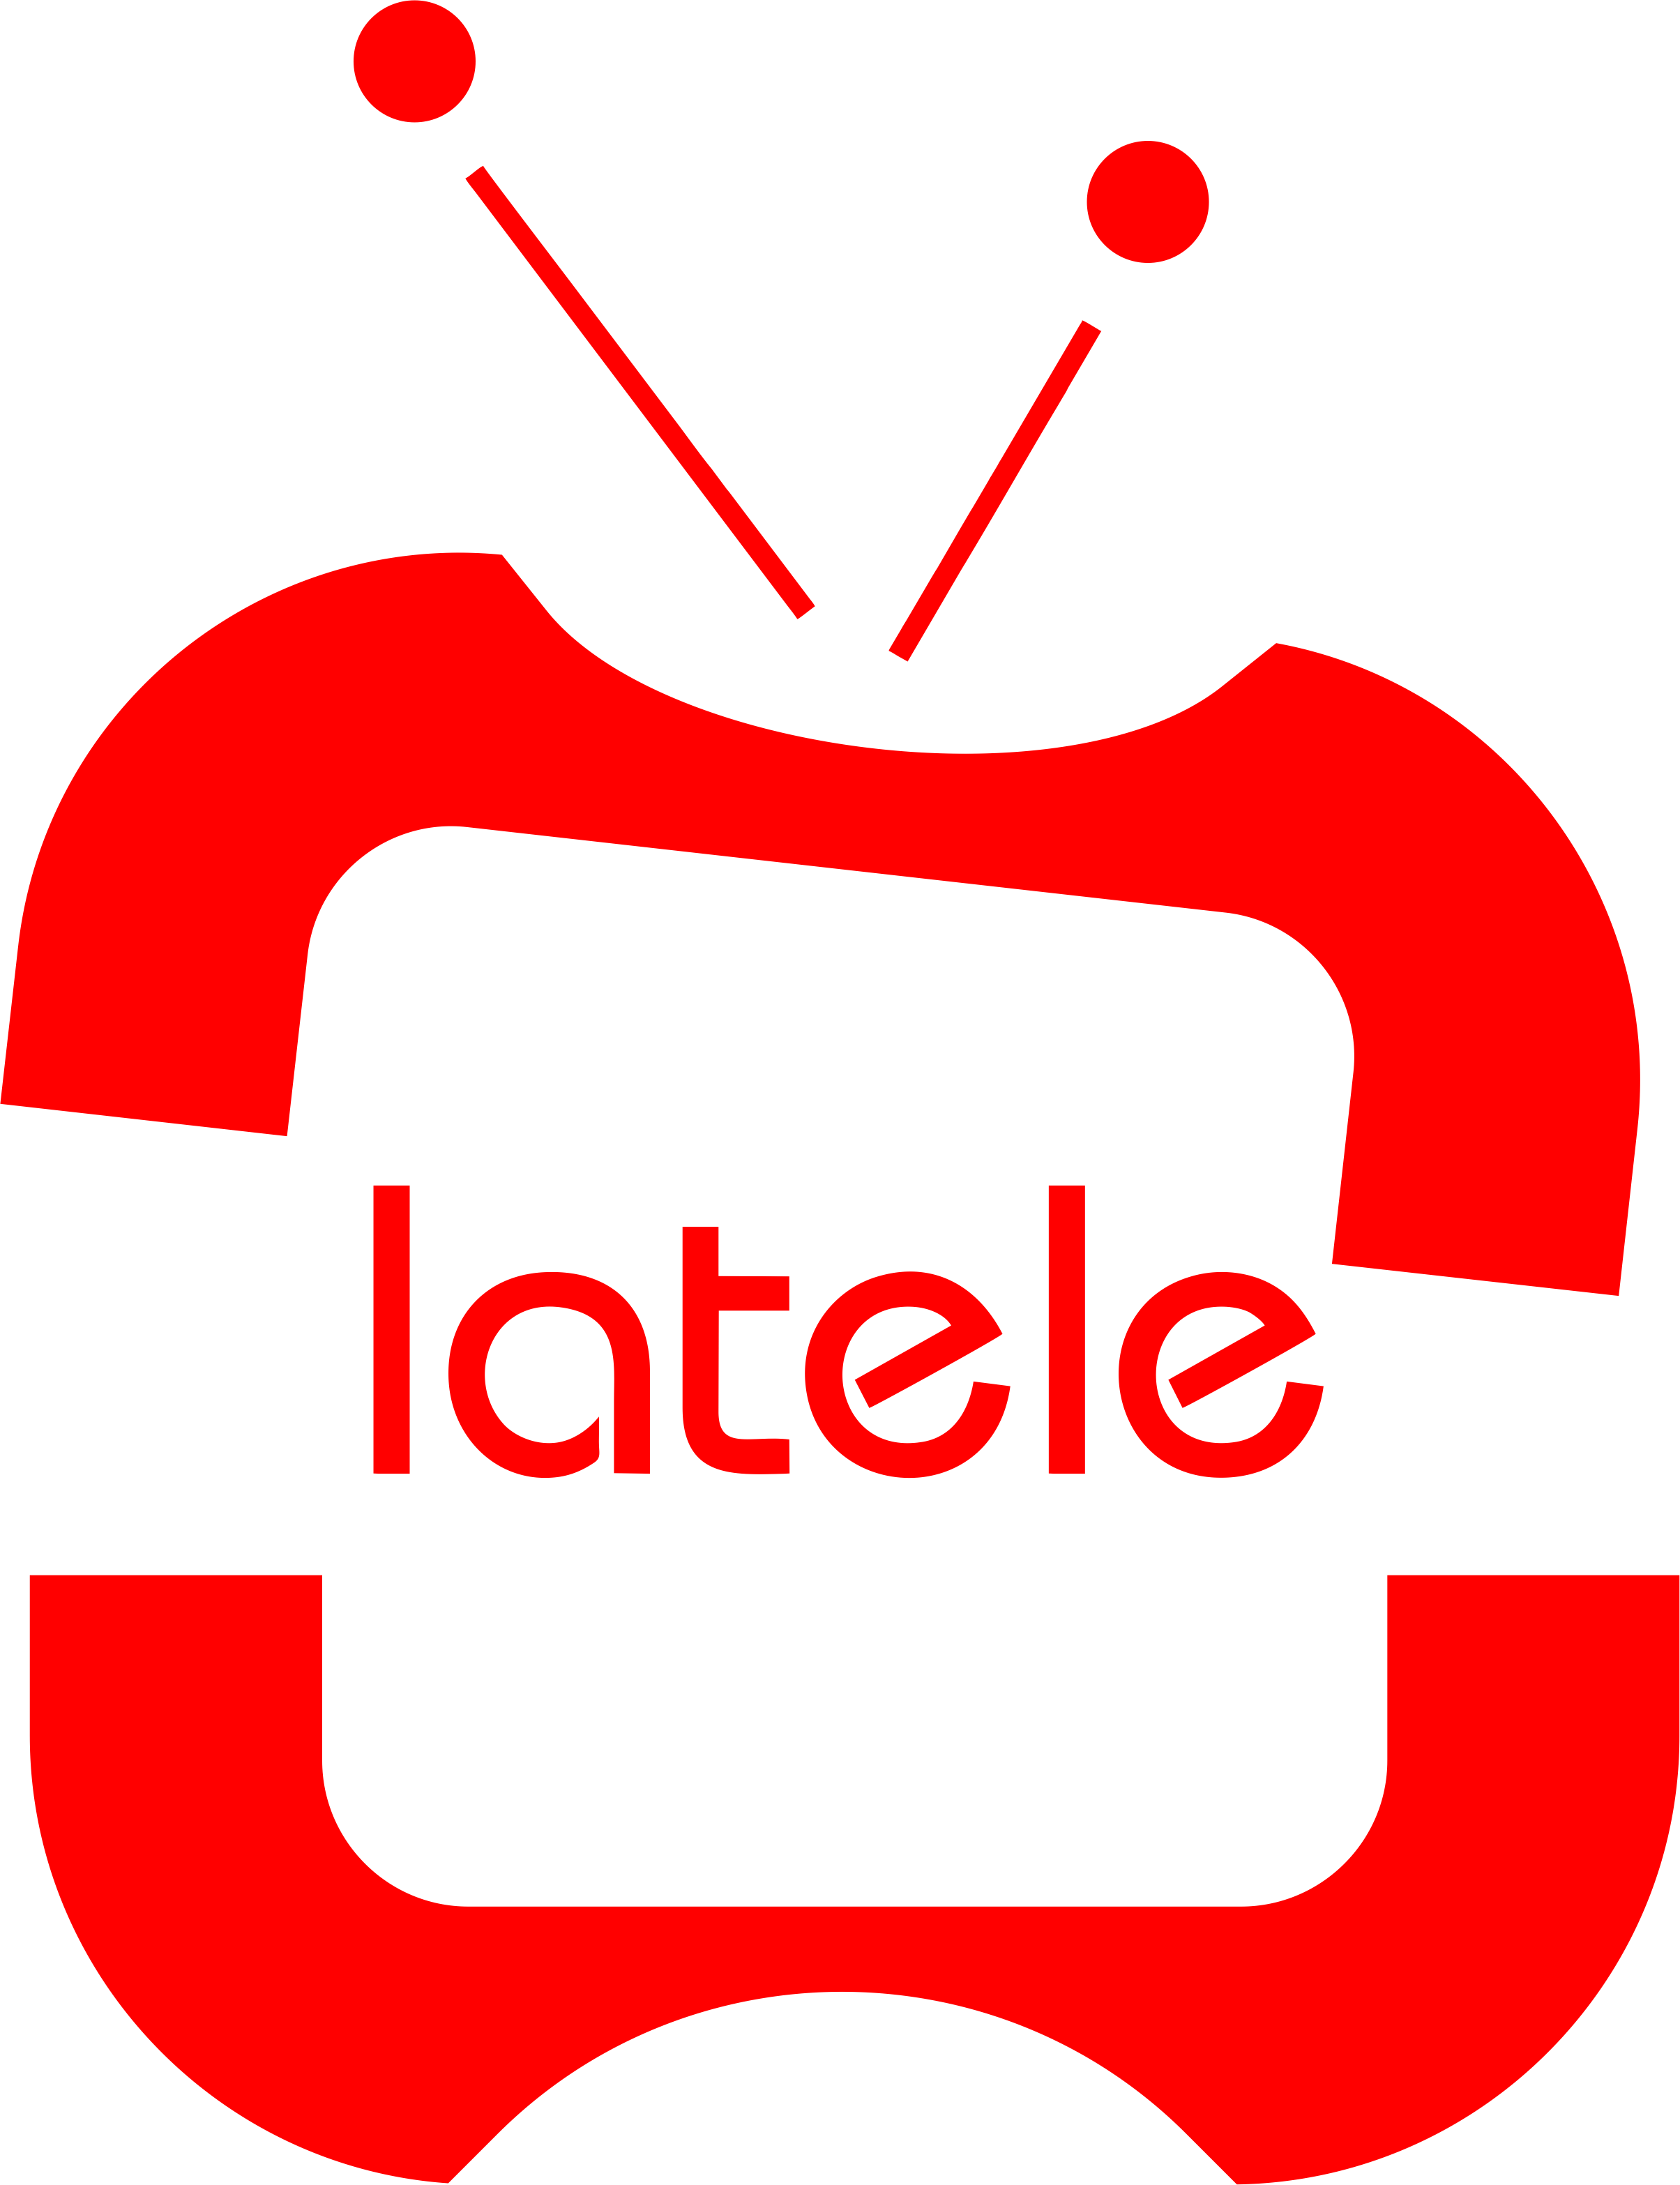 LaTele (Ecuador)